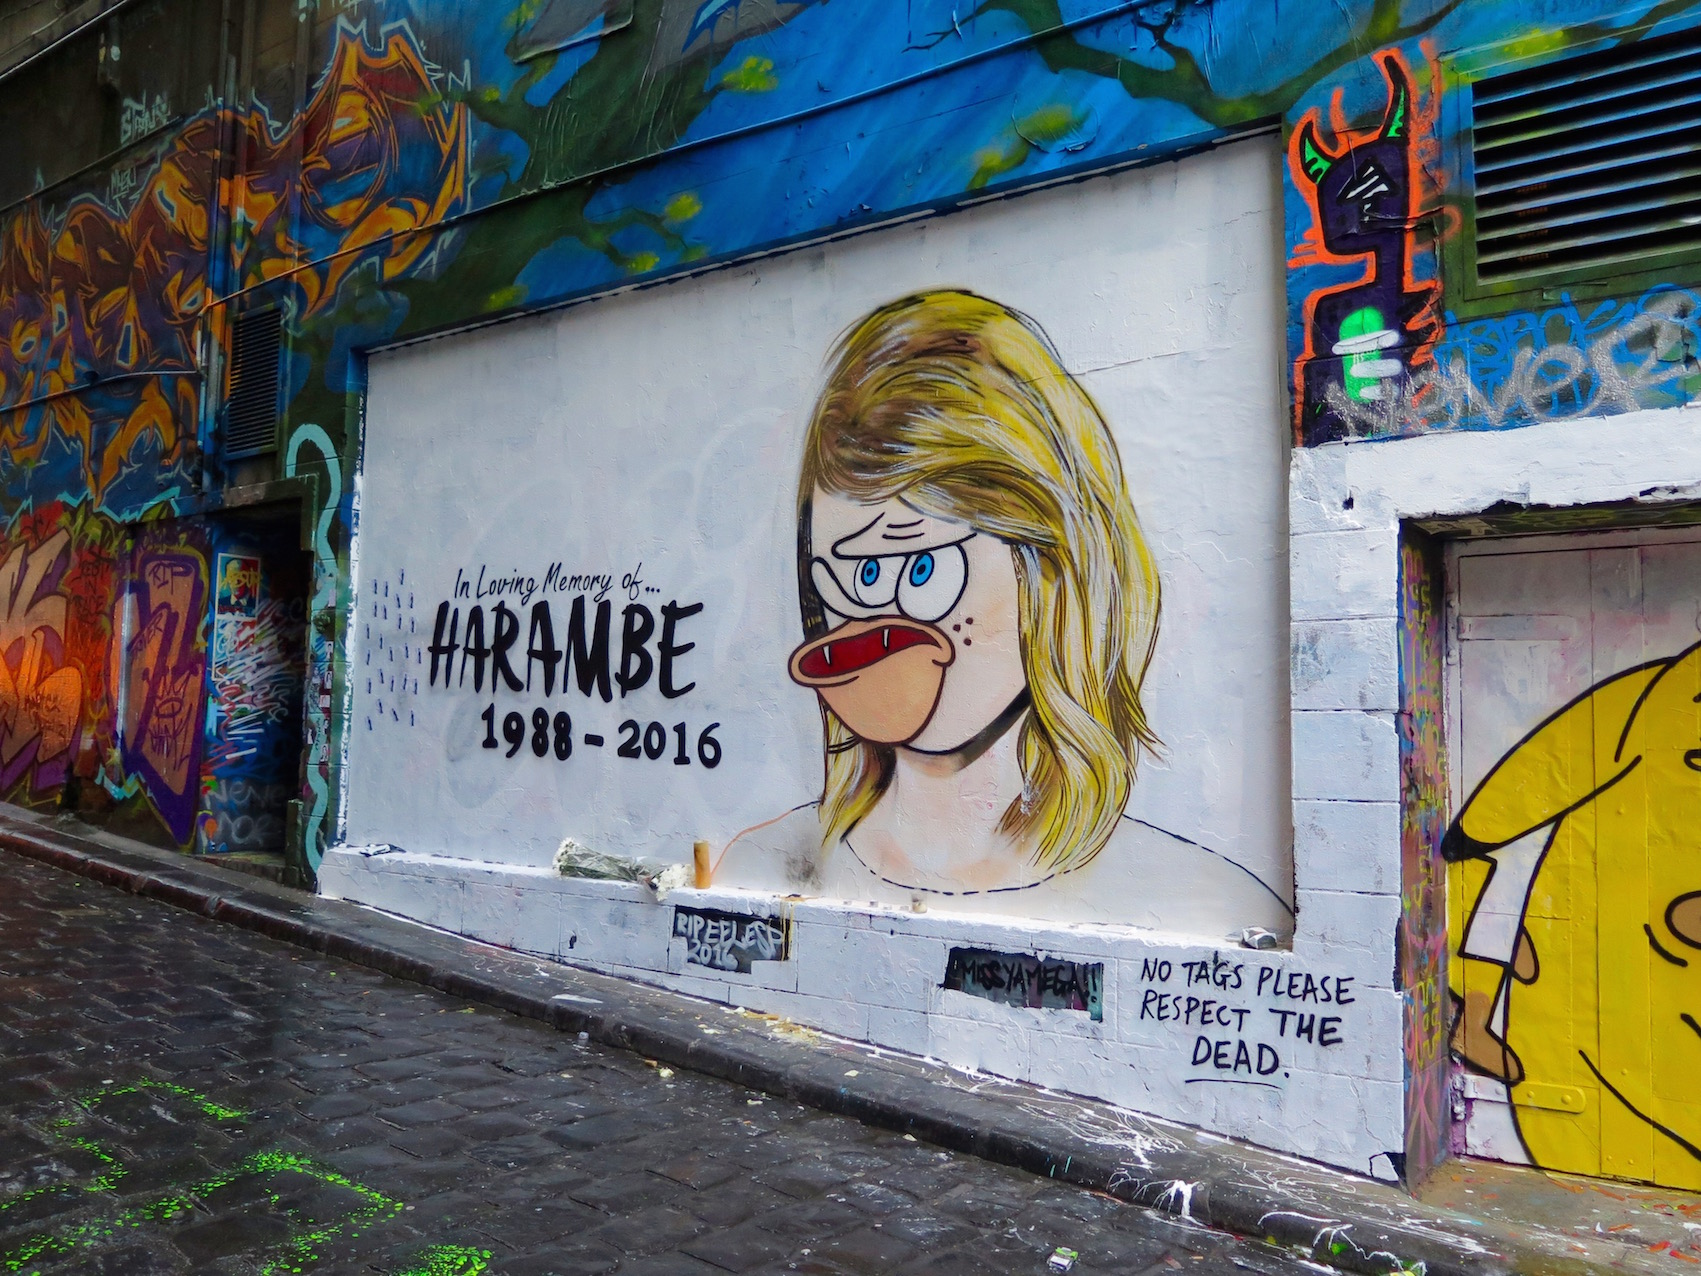 deansunshine_landofsunshine_melbourne_streetart_graffiti_Lush celebrity hosier lane 2 Harambe 2